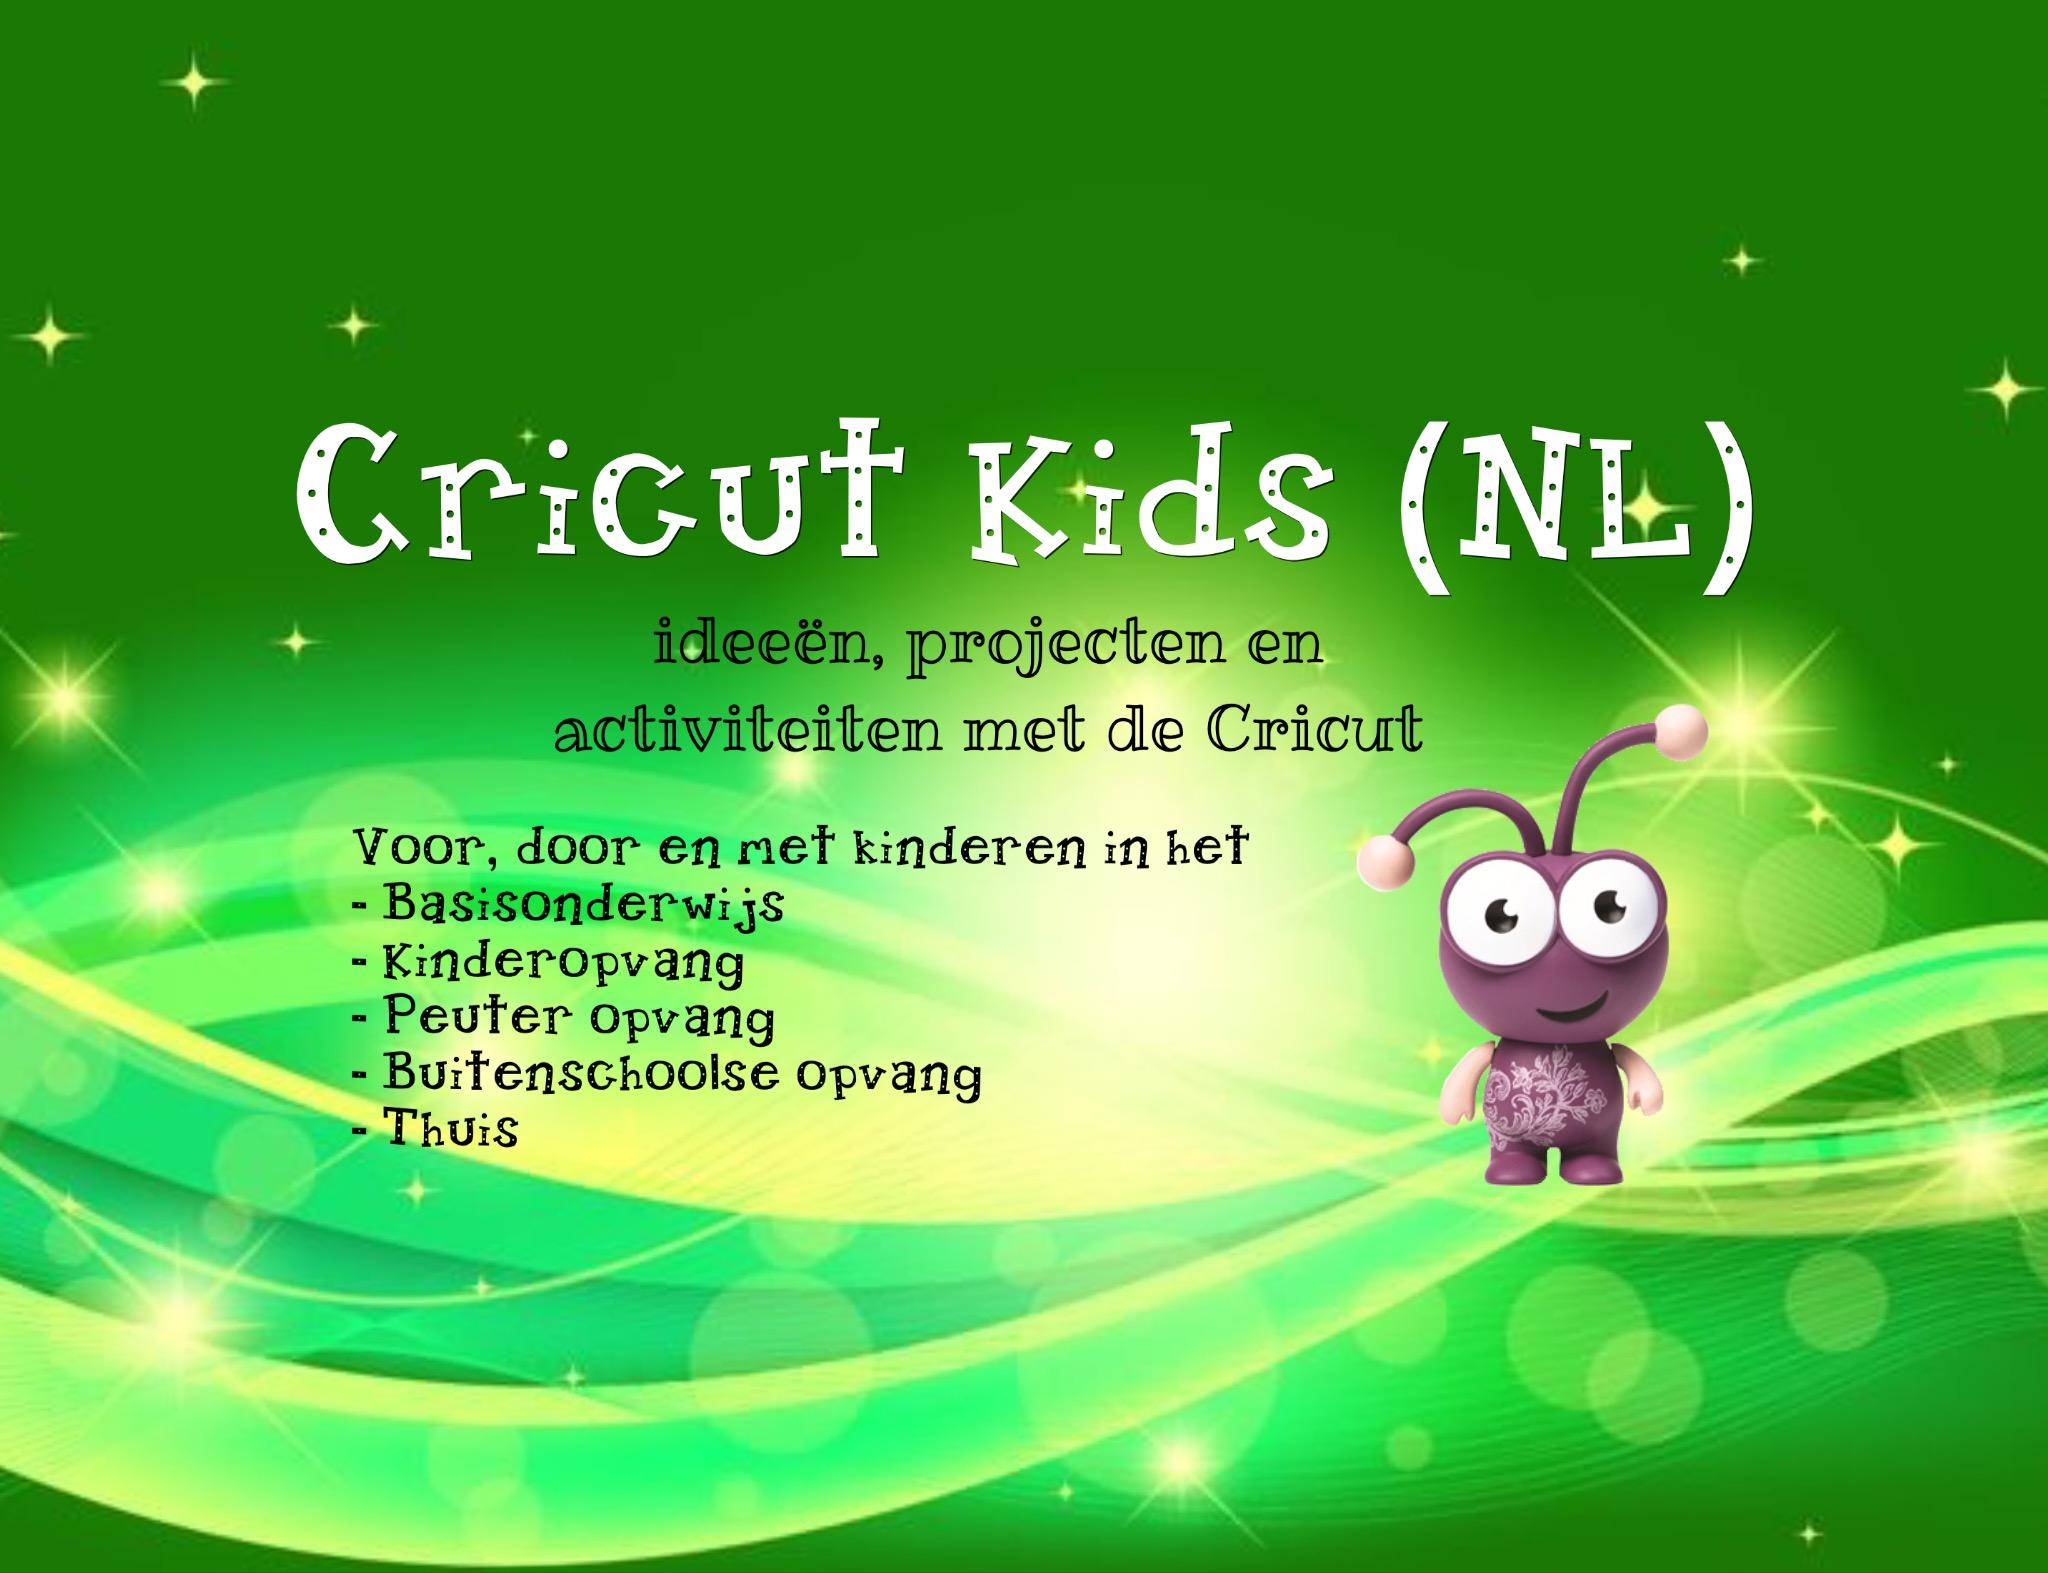 Cricut Kids